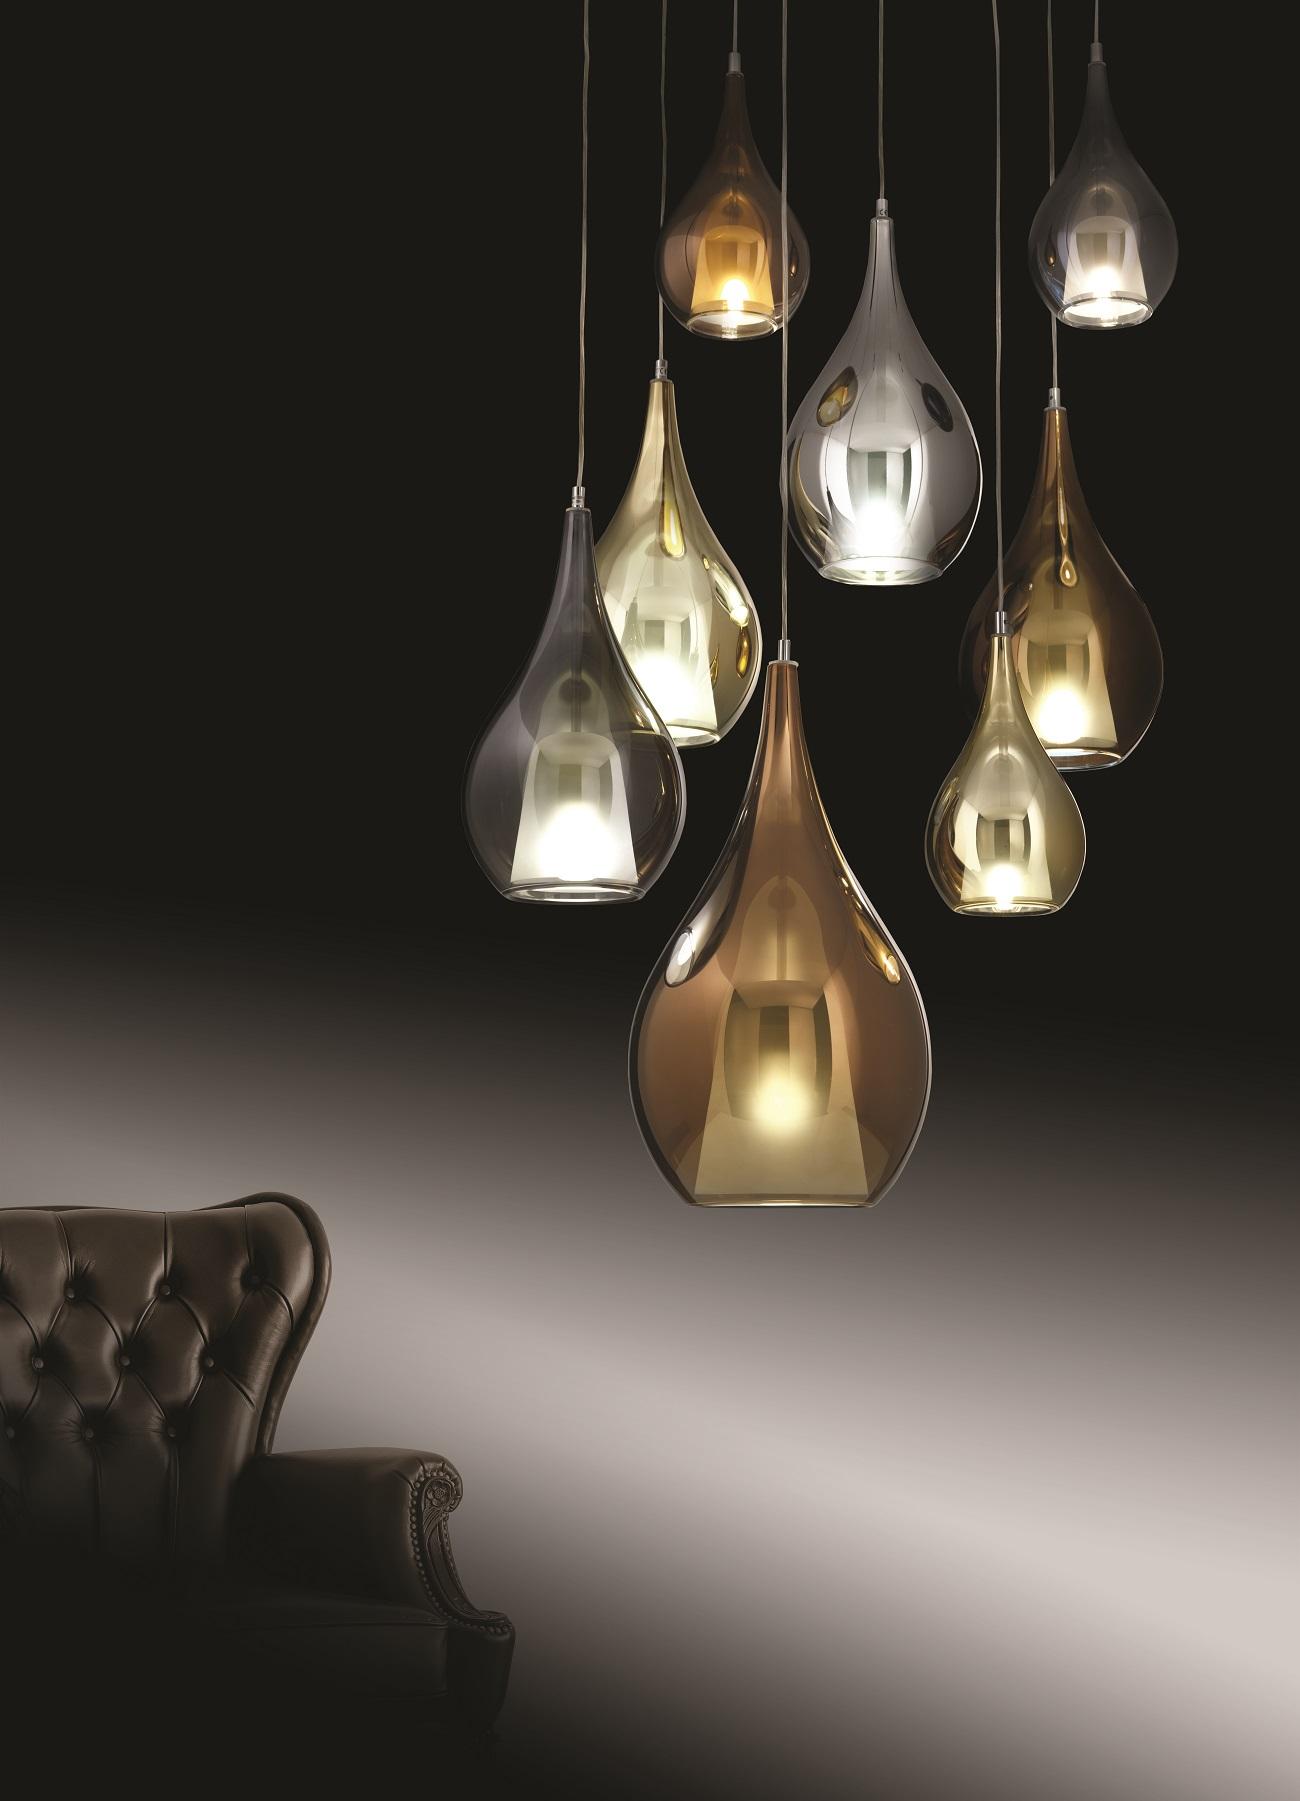 Zoe.canginietucci.blown.glass.design.light.lighting.lamp